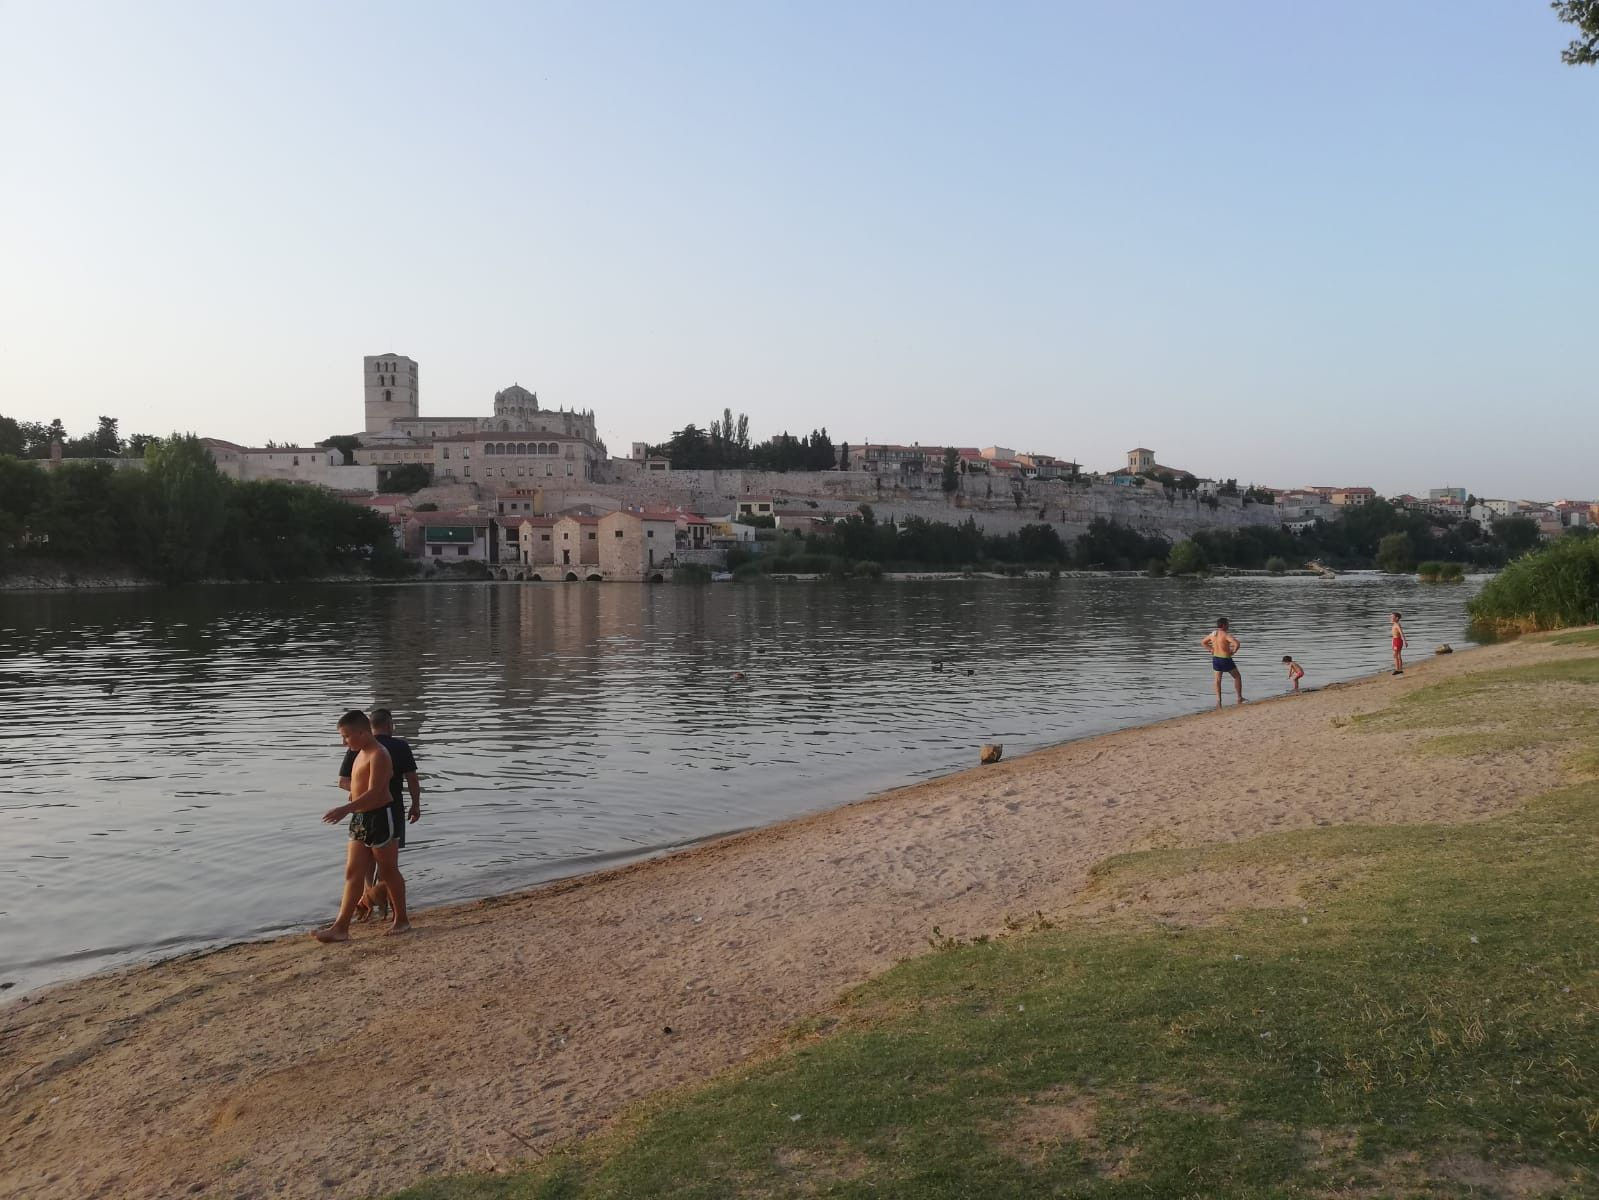 Calor playa pelambres verano rio (6)